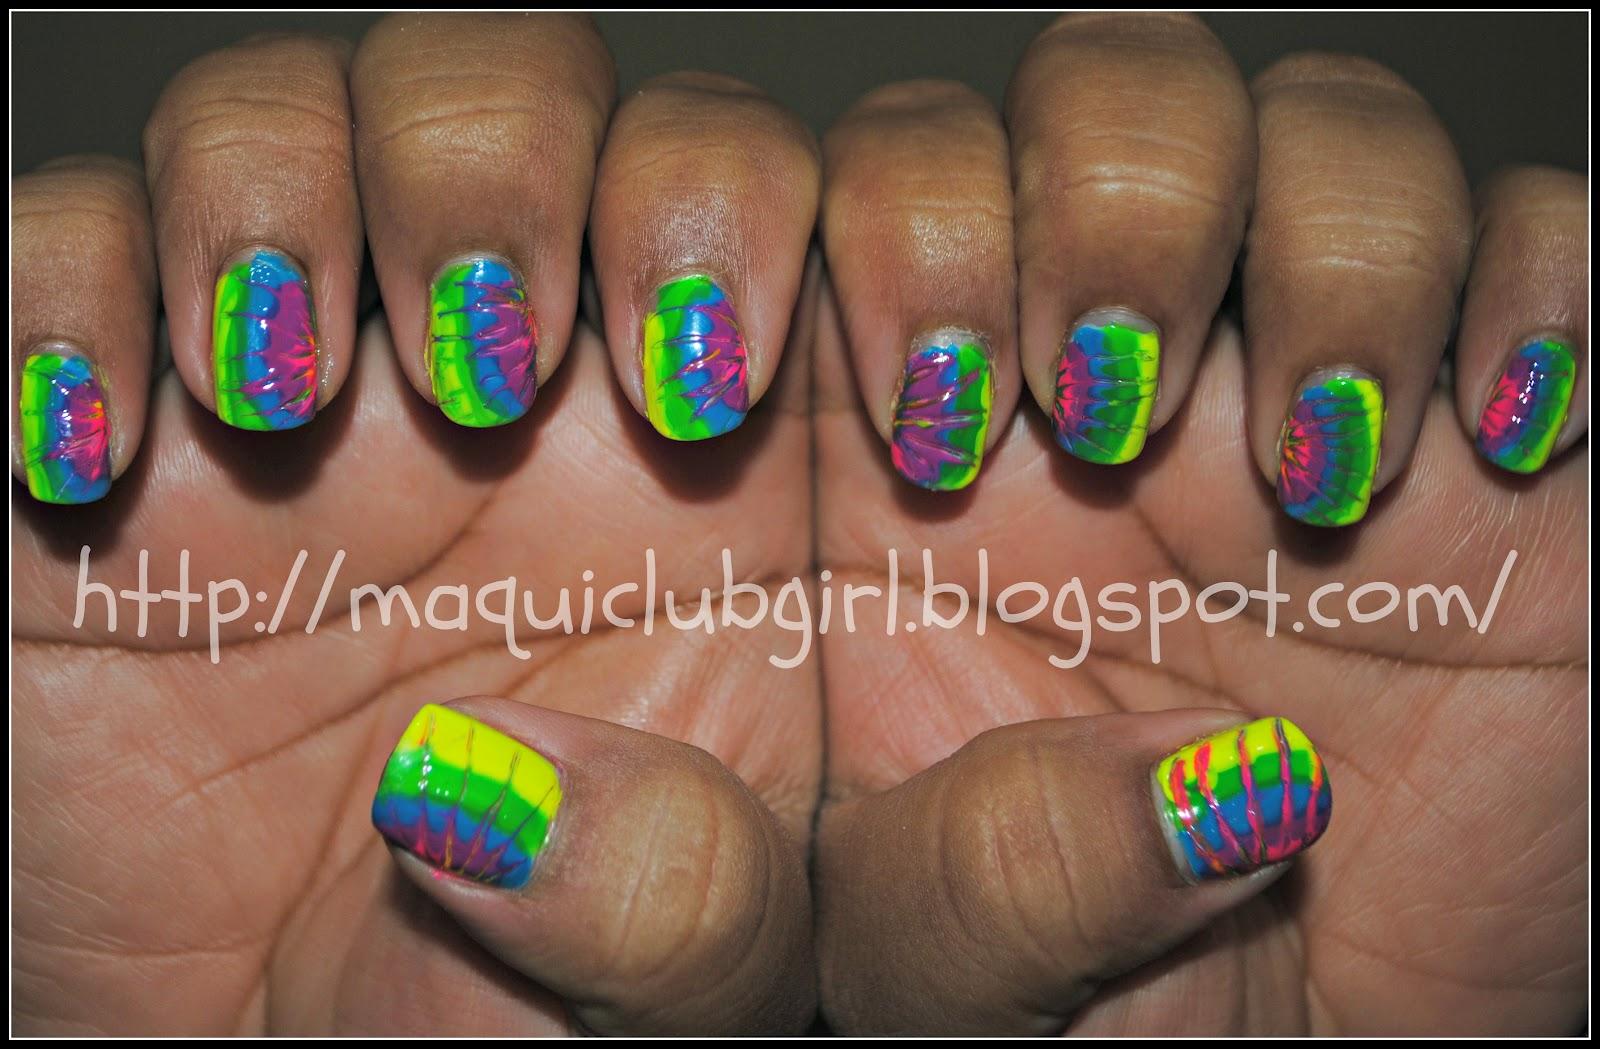 MAQUICLUB GIRL: MSMD: Hippies Nails